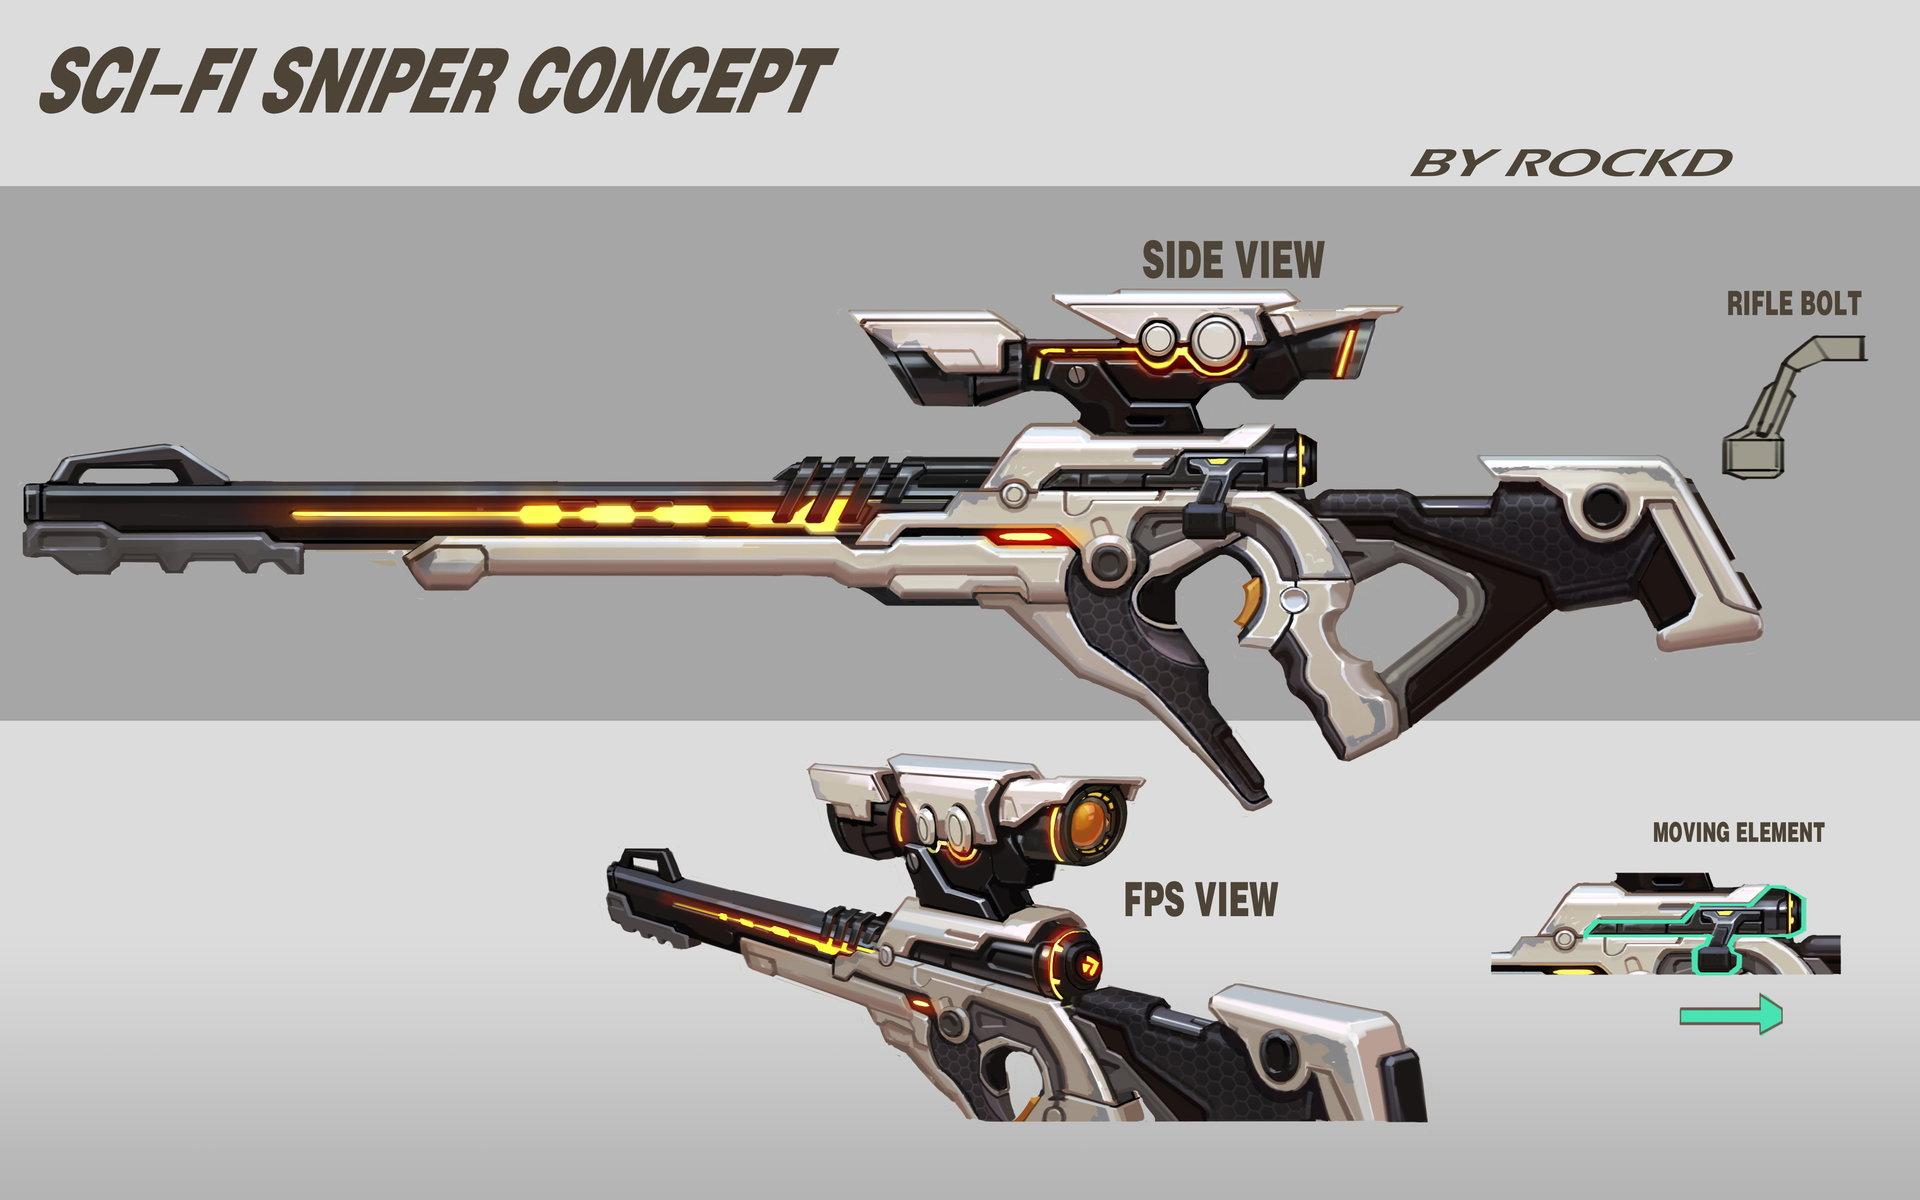 Rock d scifi sniper